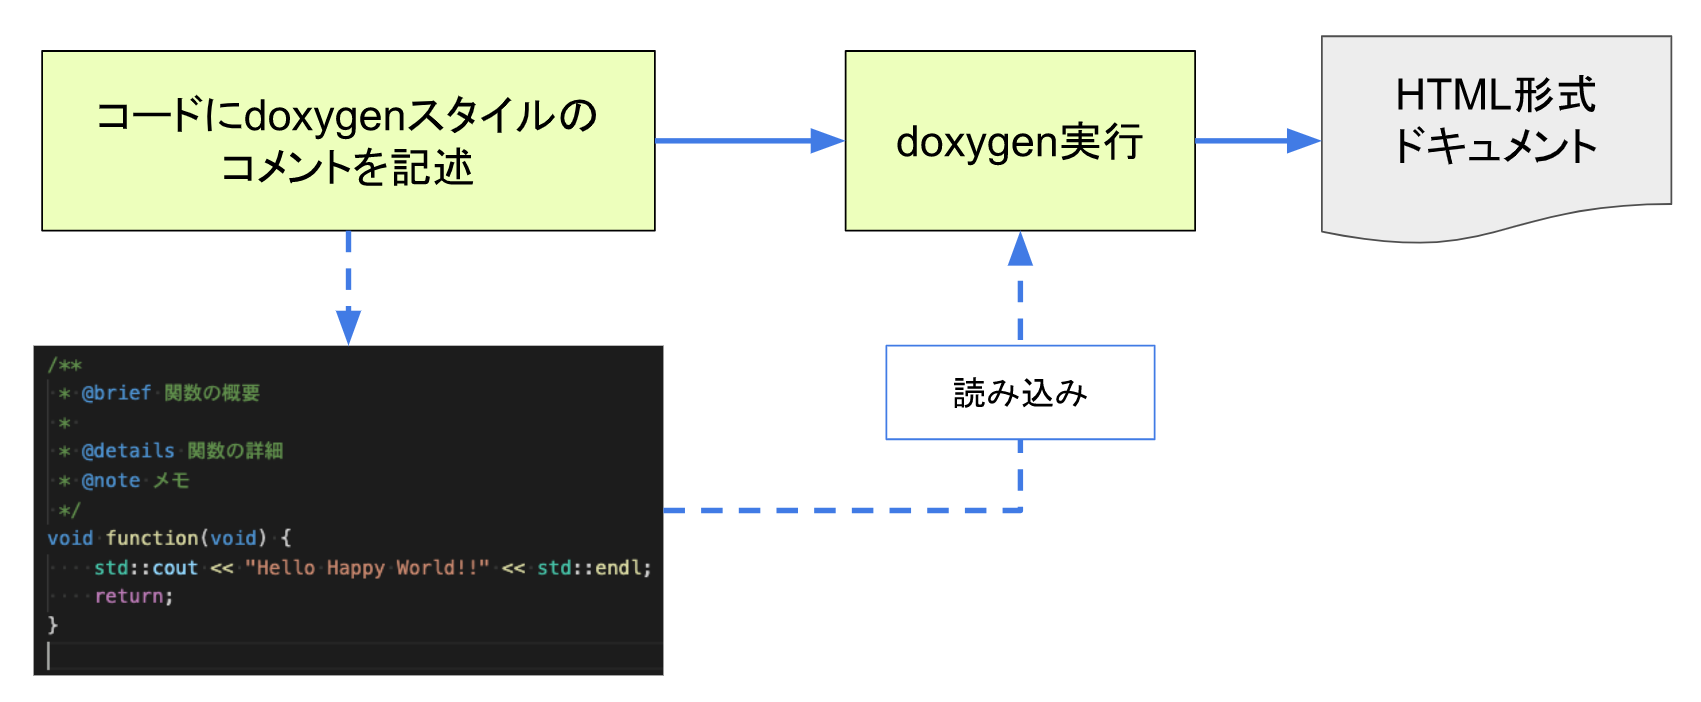 doxygenドキュメント生成の流れ